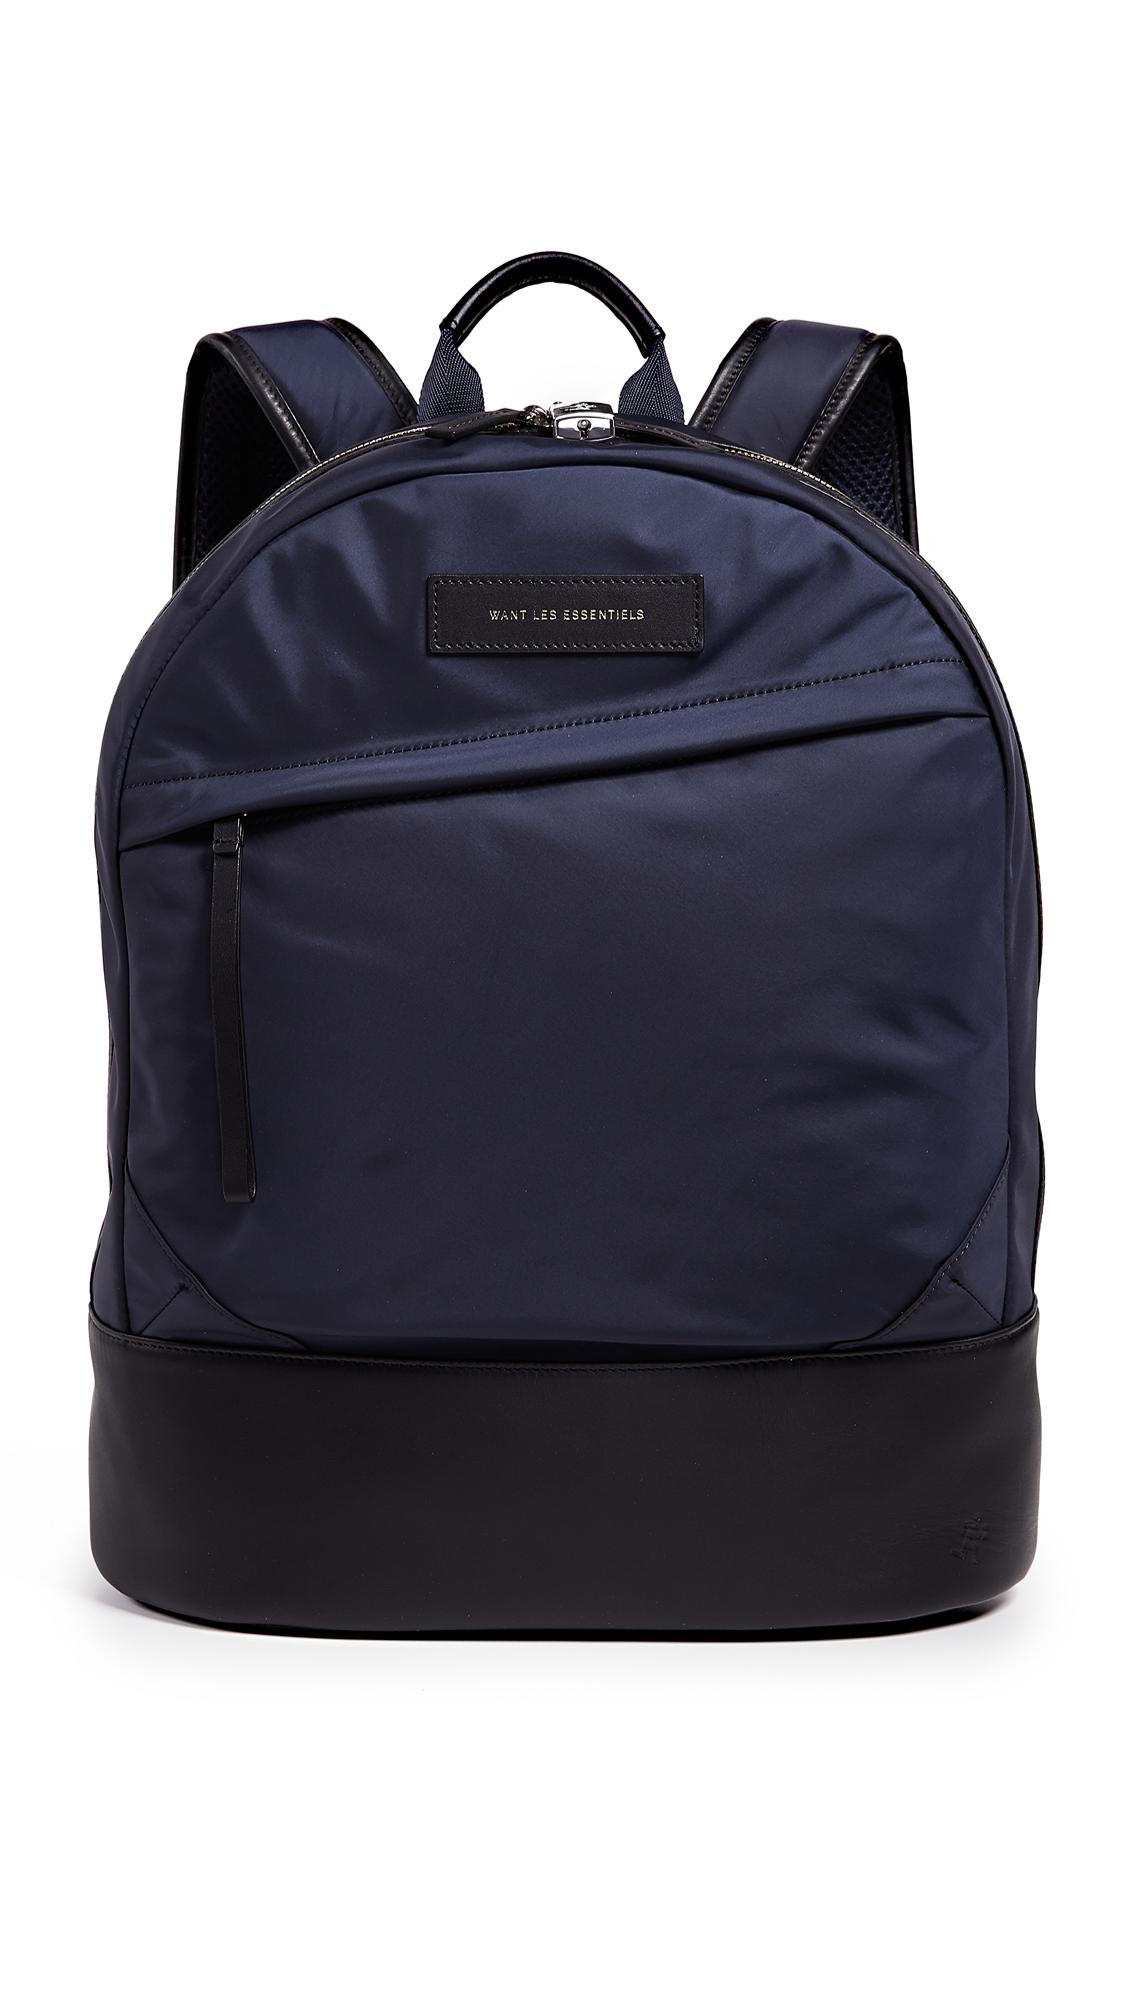 WANT LES ESSENTIELS DE LA VIE 'Kastrup' Backpack - Blue in Navy